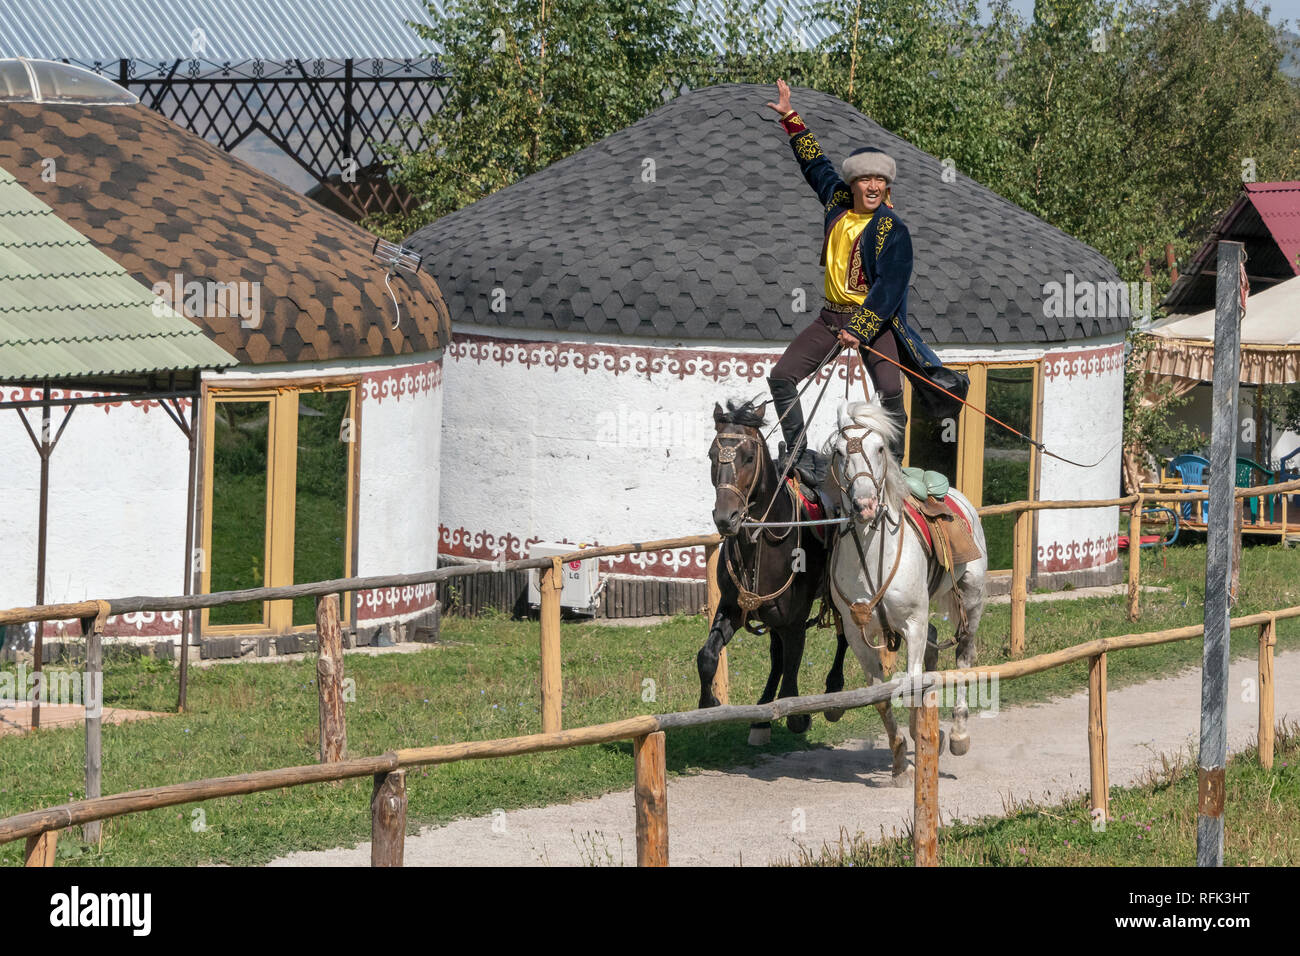 Kazakh trick rider on two horses, riding by yurts, Alamty, Kazakhstan Stock Photo